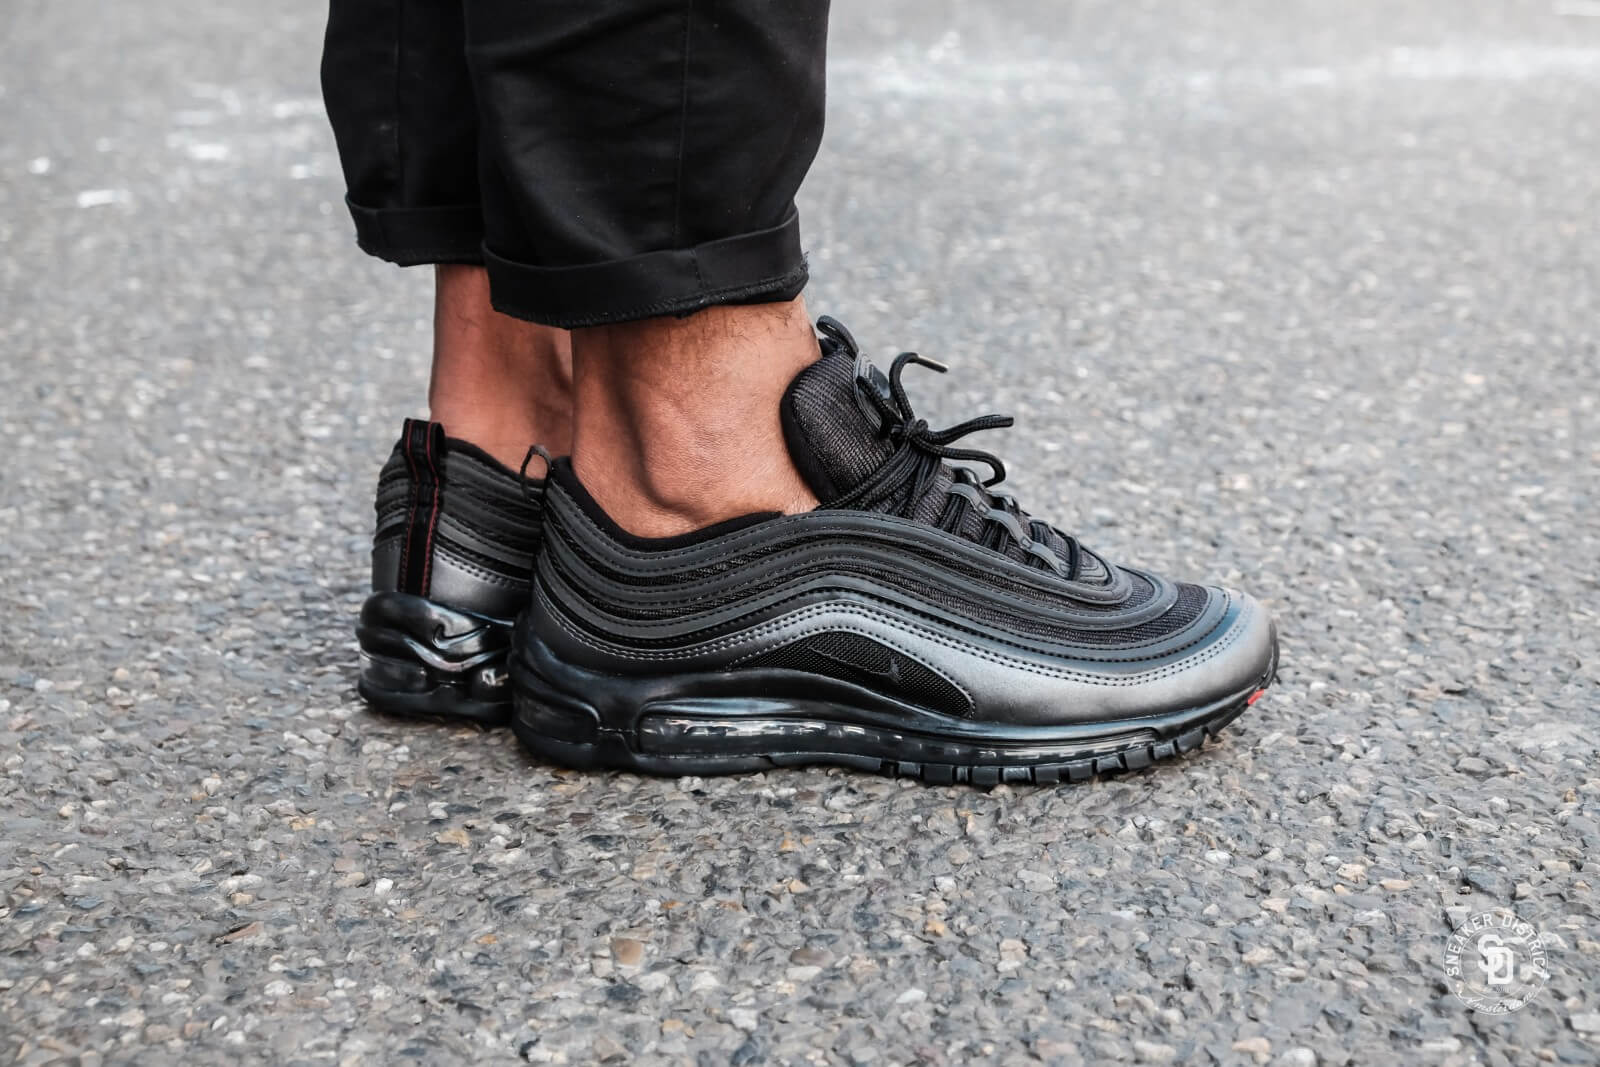 Kleding en accessoires Sportschoenen Nike Wmns Air Max 97